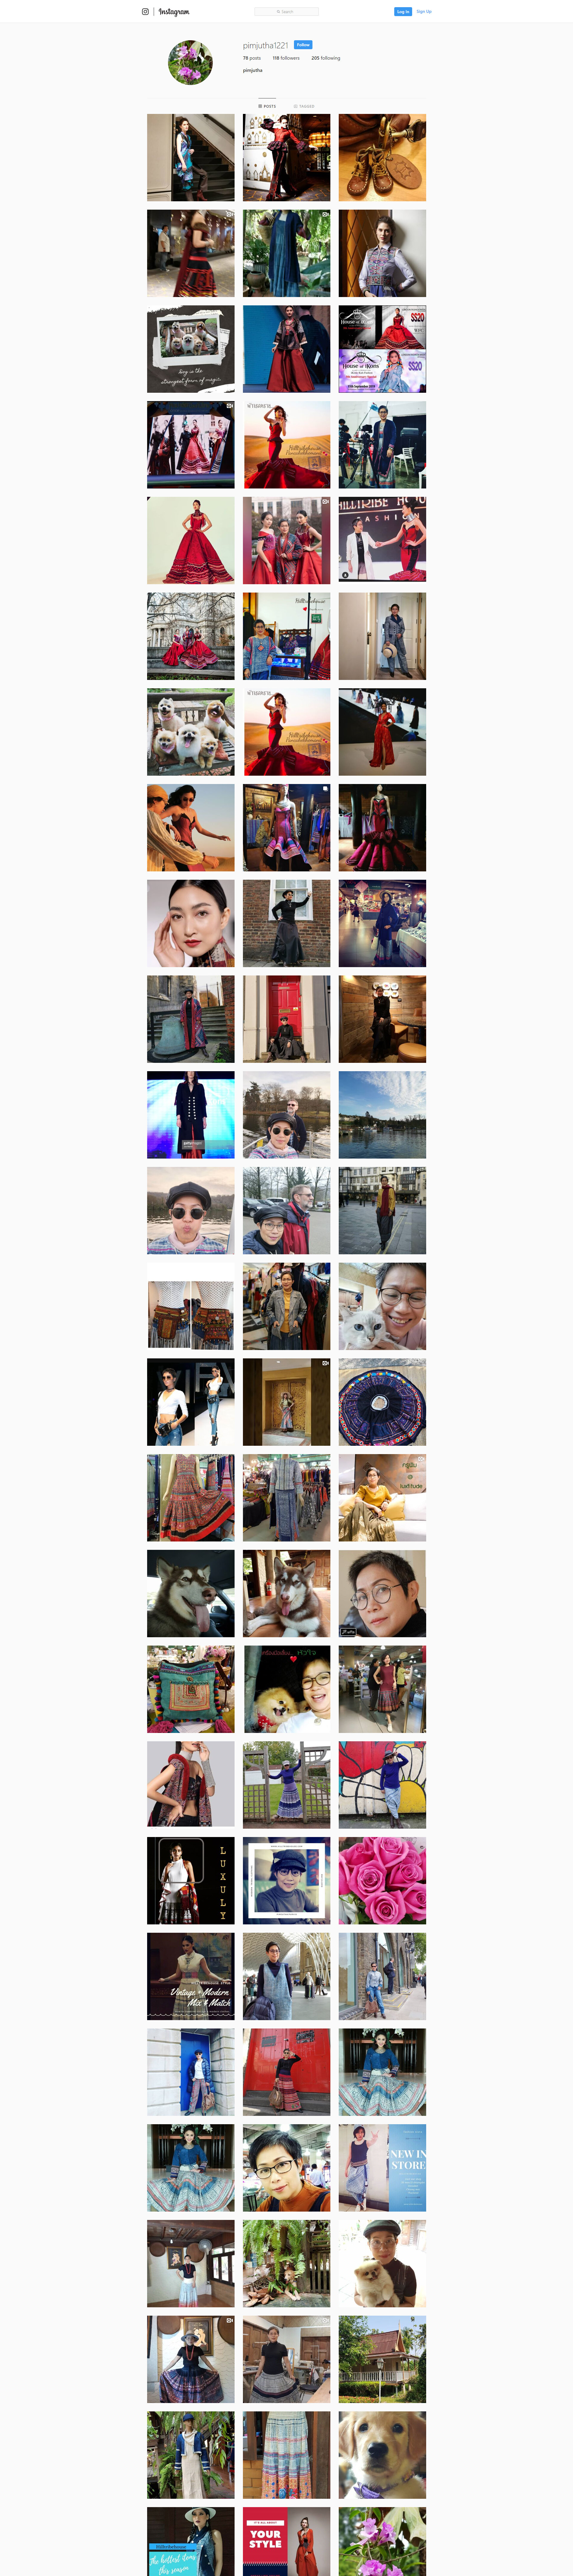 1screencapture-instagram-pimjutha1221-2019-09-29-15_28_06.jpg